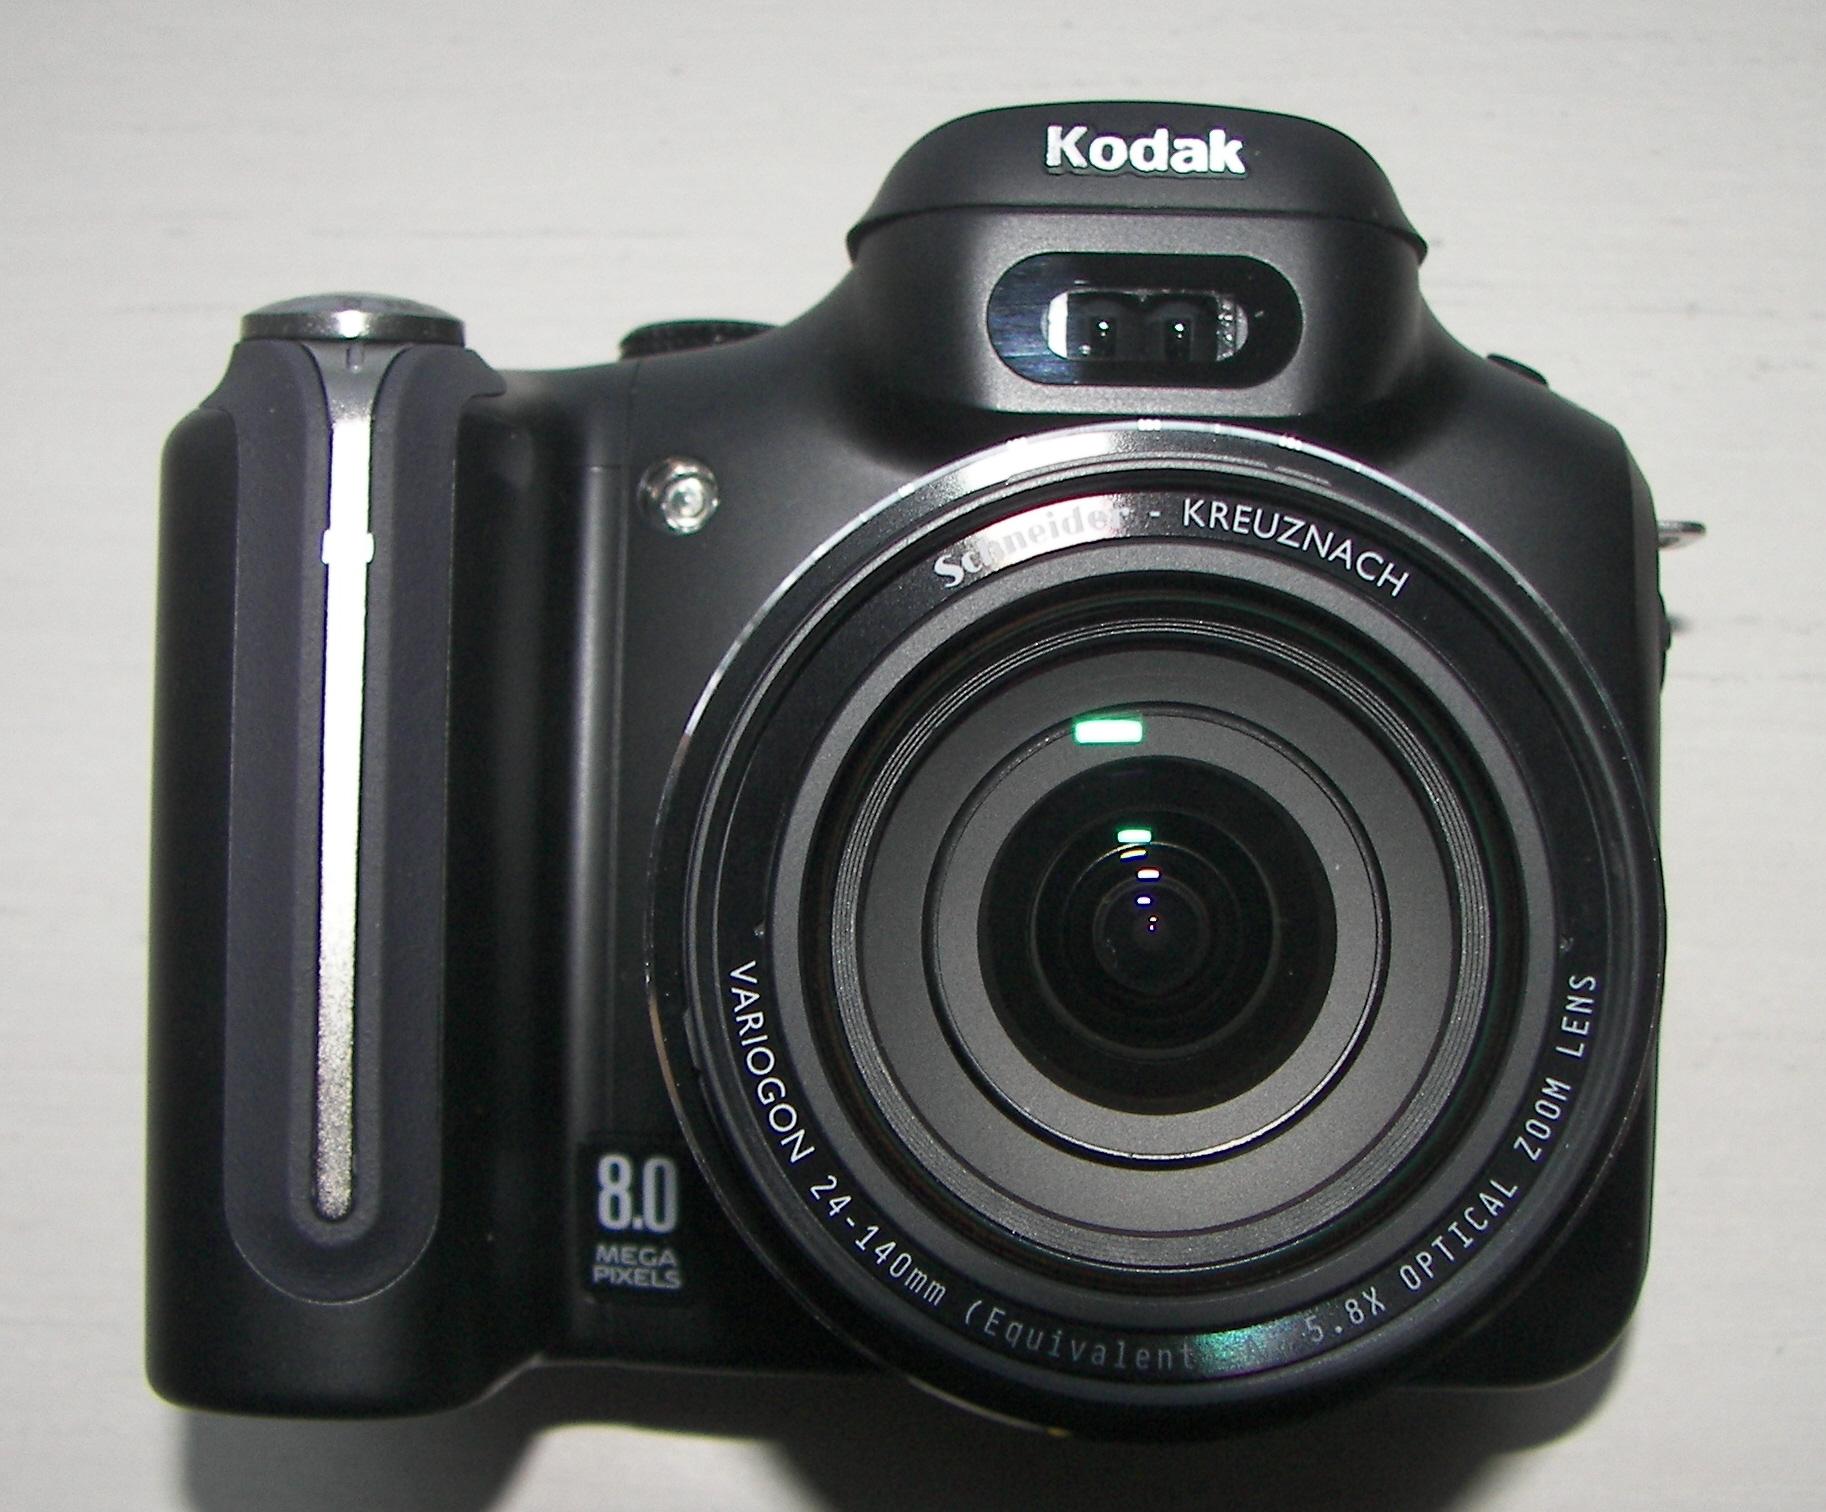 Kodak EasyShare P880 - Wikipedia